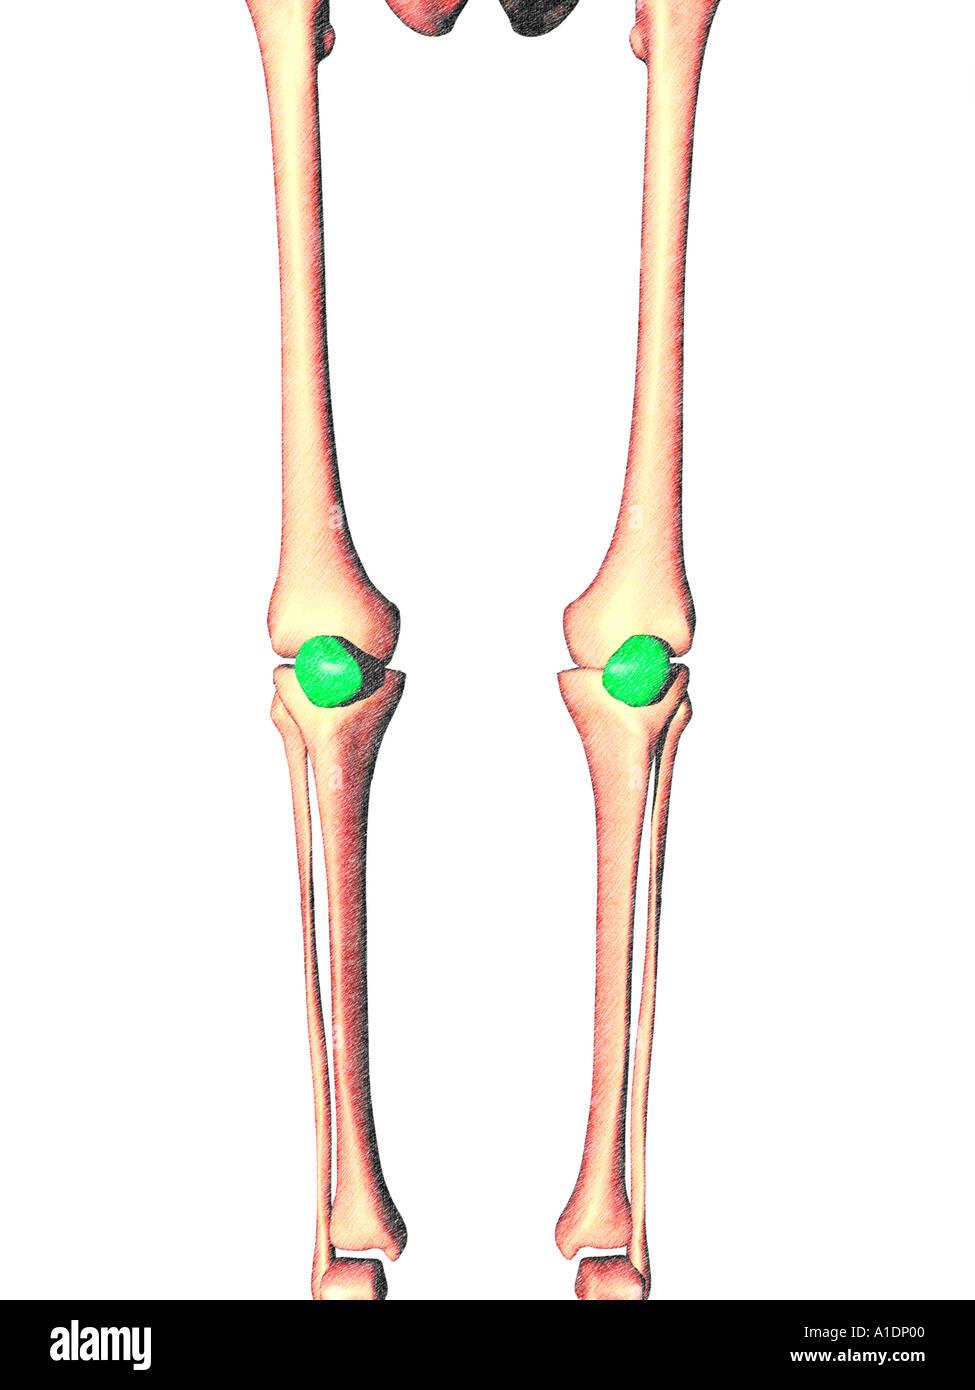 medium resolution of illustration of patella highlighted on legs